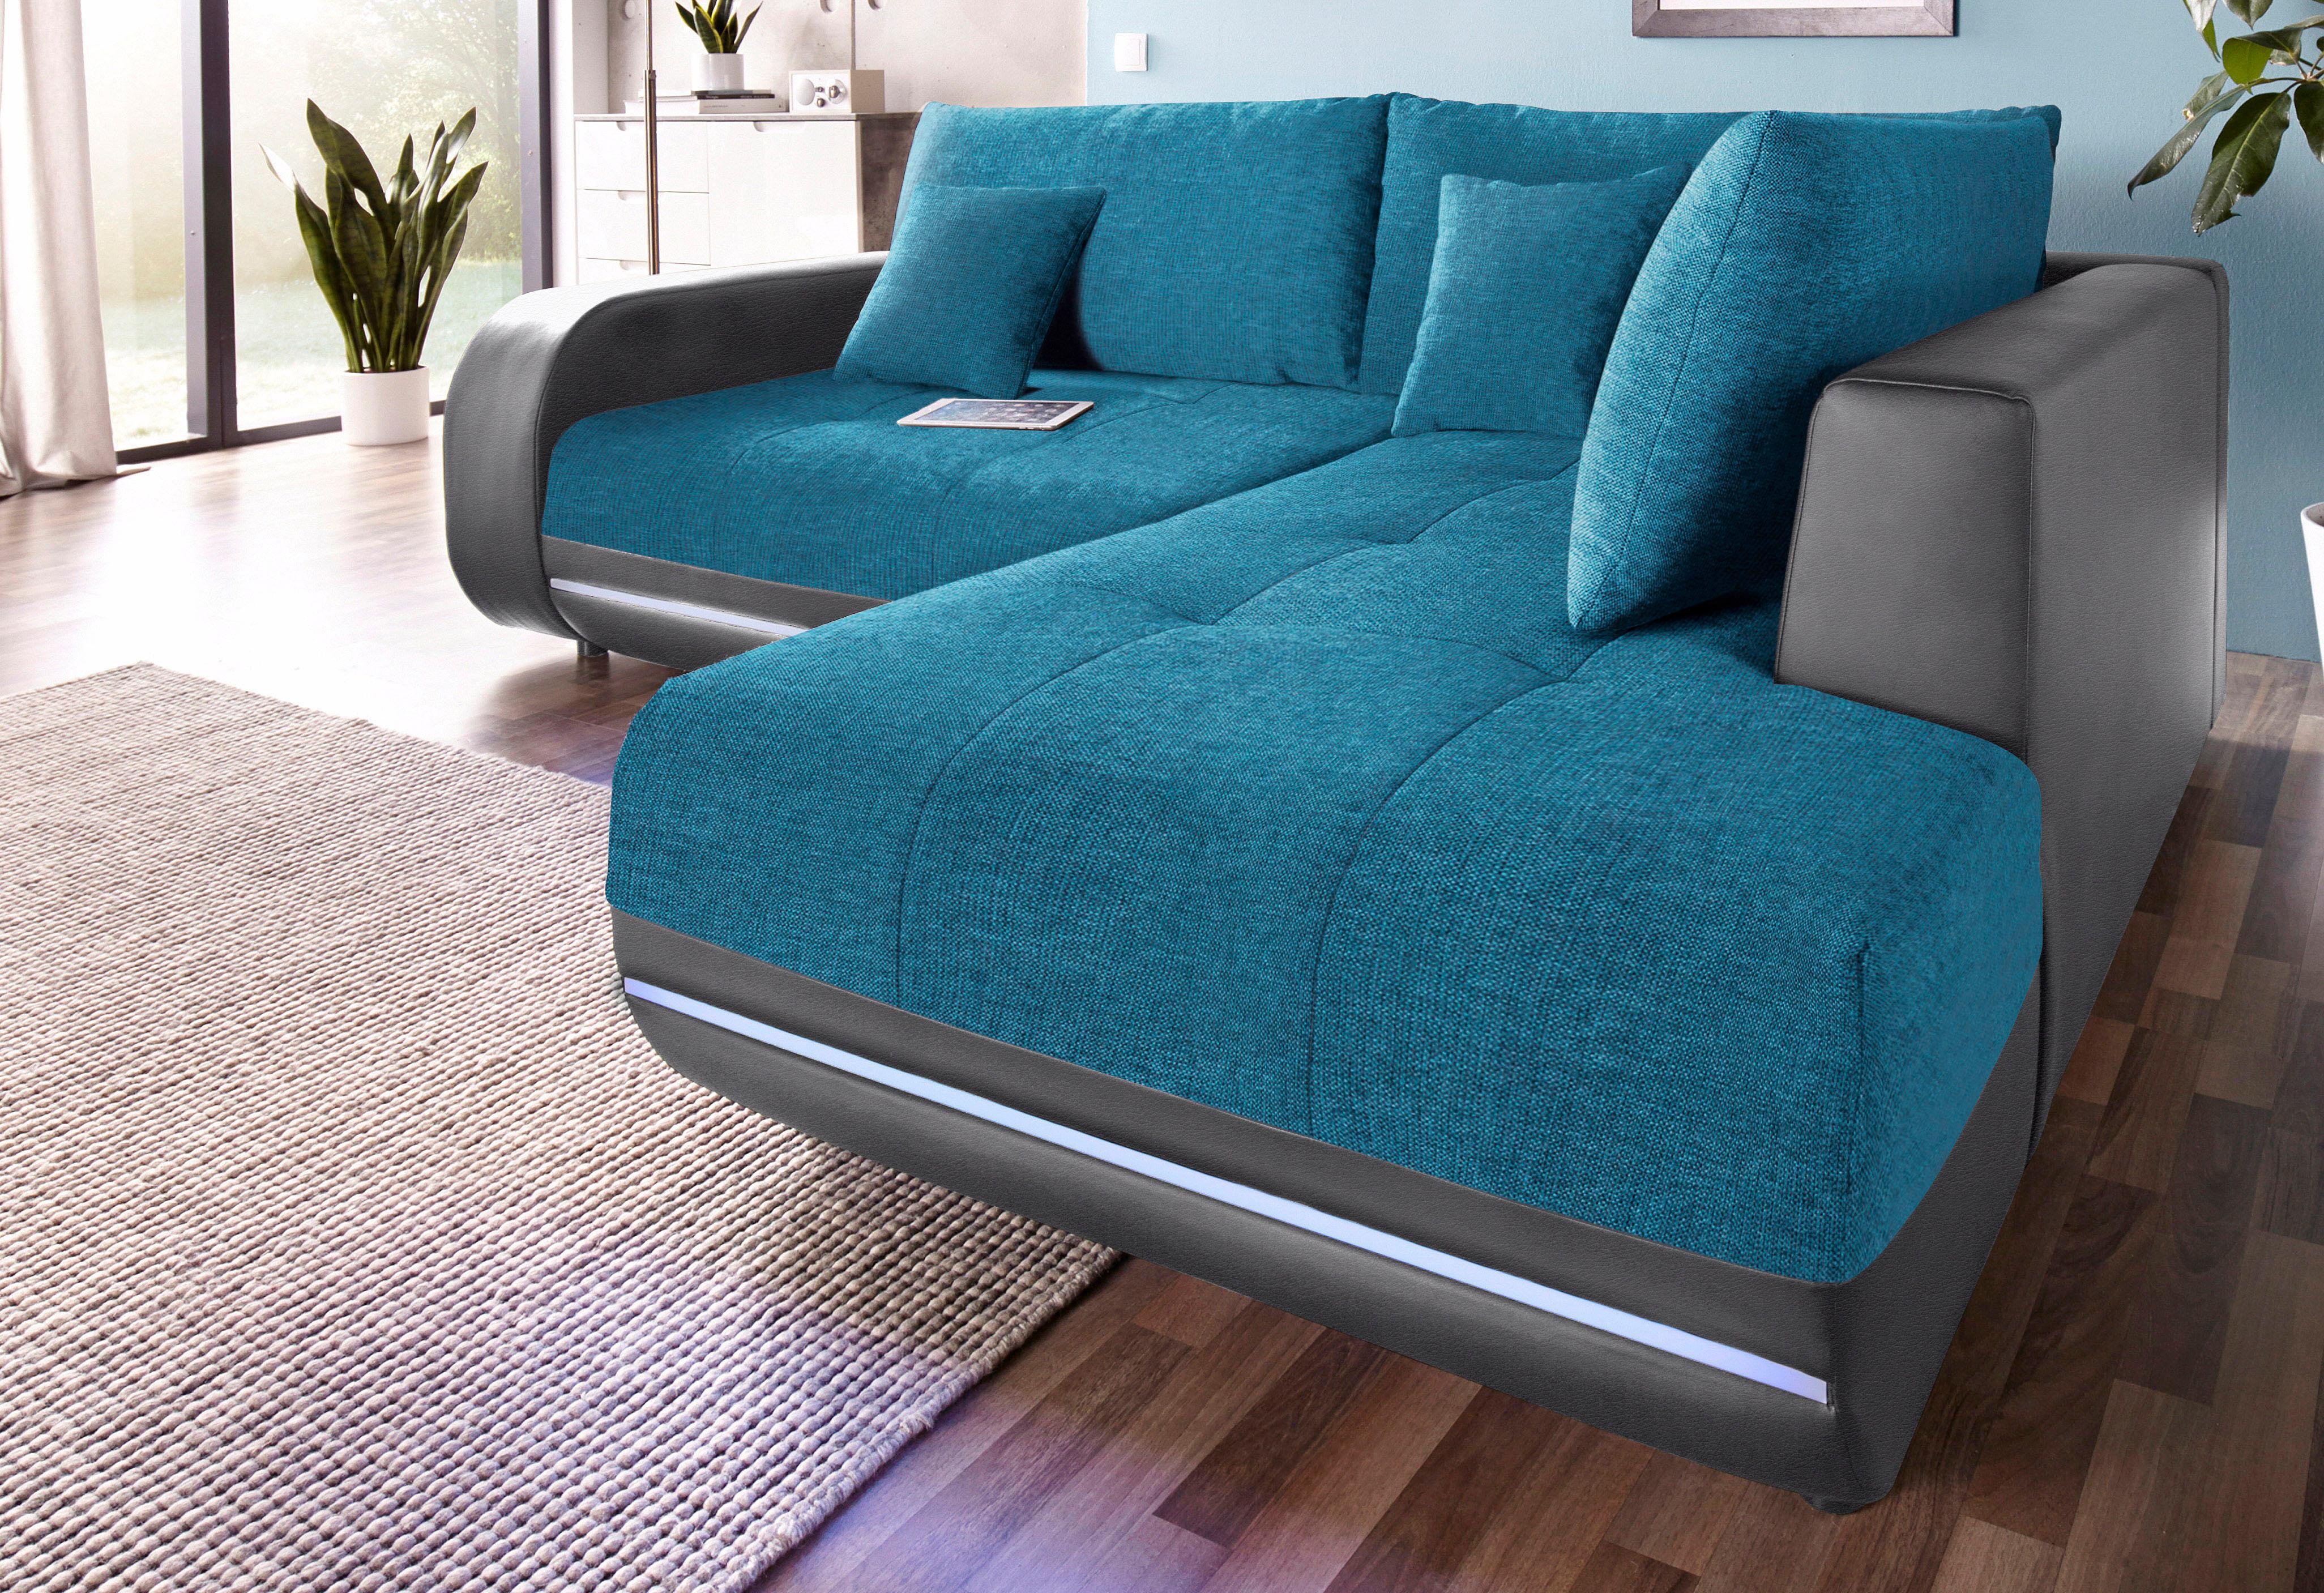 Nova Via Polsterecke, wahlweise mit Bettfunktion | Wohnzimmer > Sofas & Couches > Ecksofas & Eckcouches | Microfaser - Polyester - Kunstleder | NOVA VIA